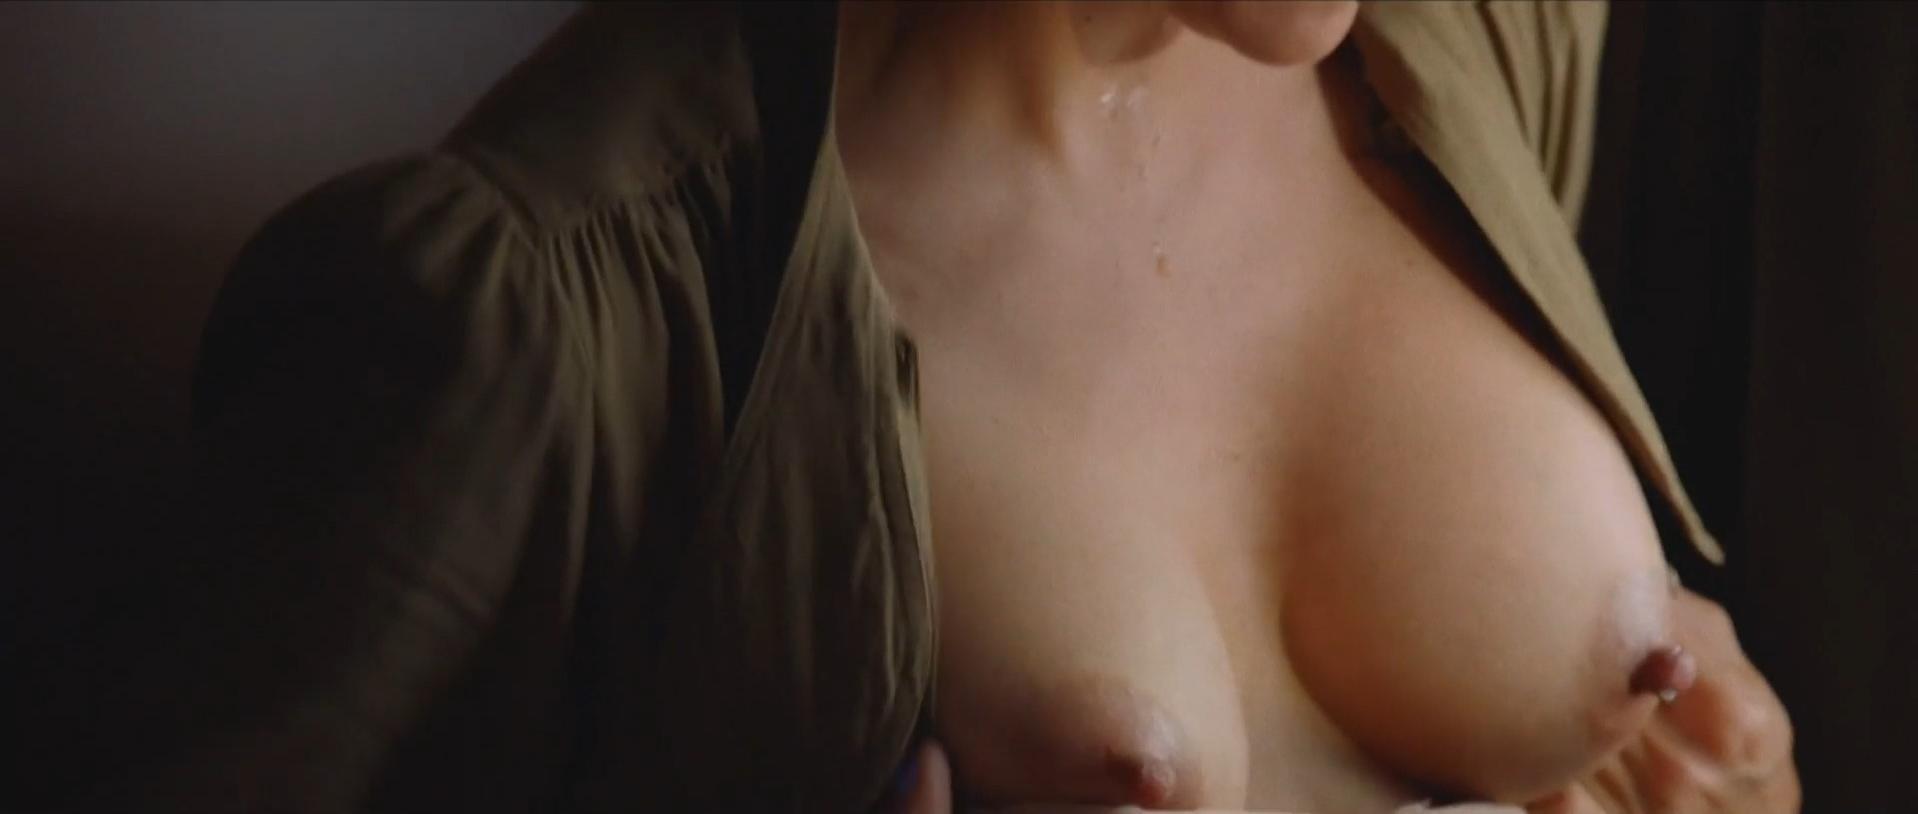 de nude Emma caunes